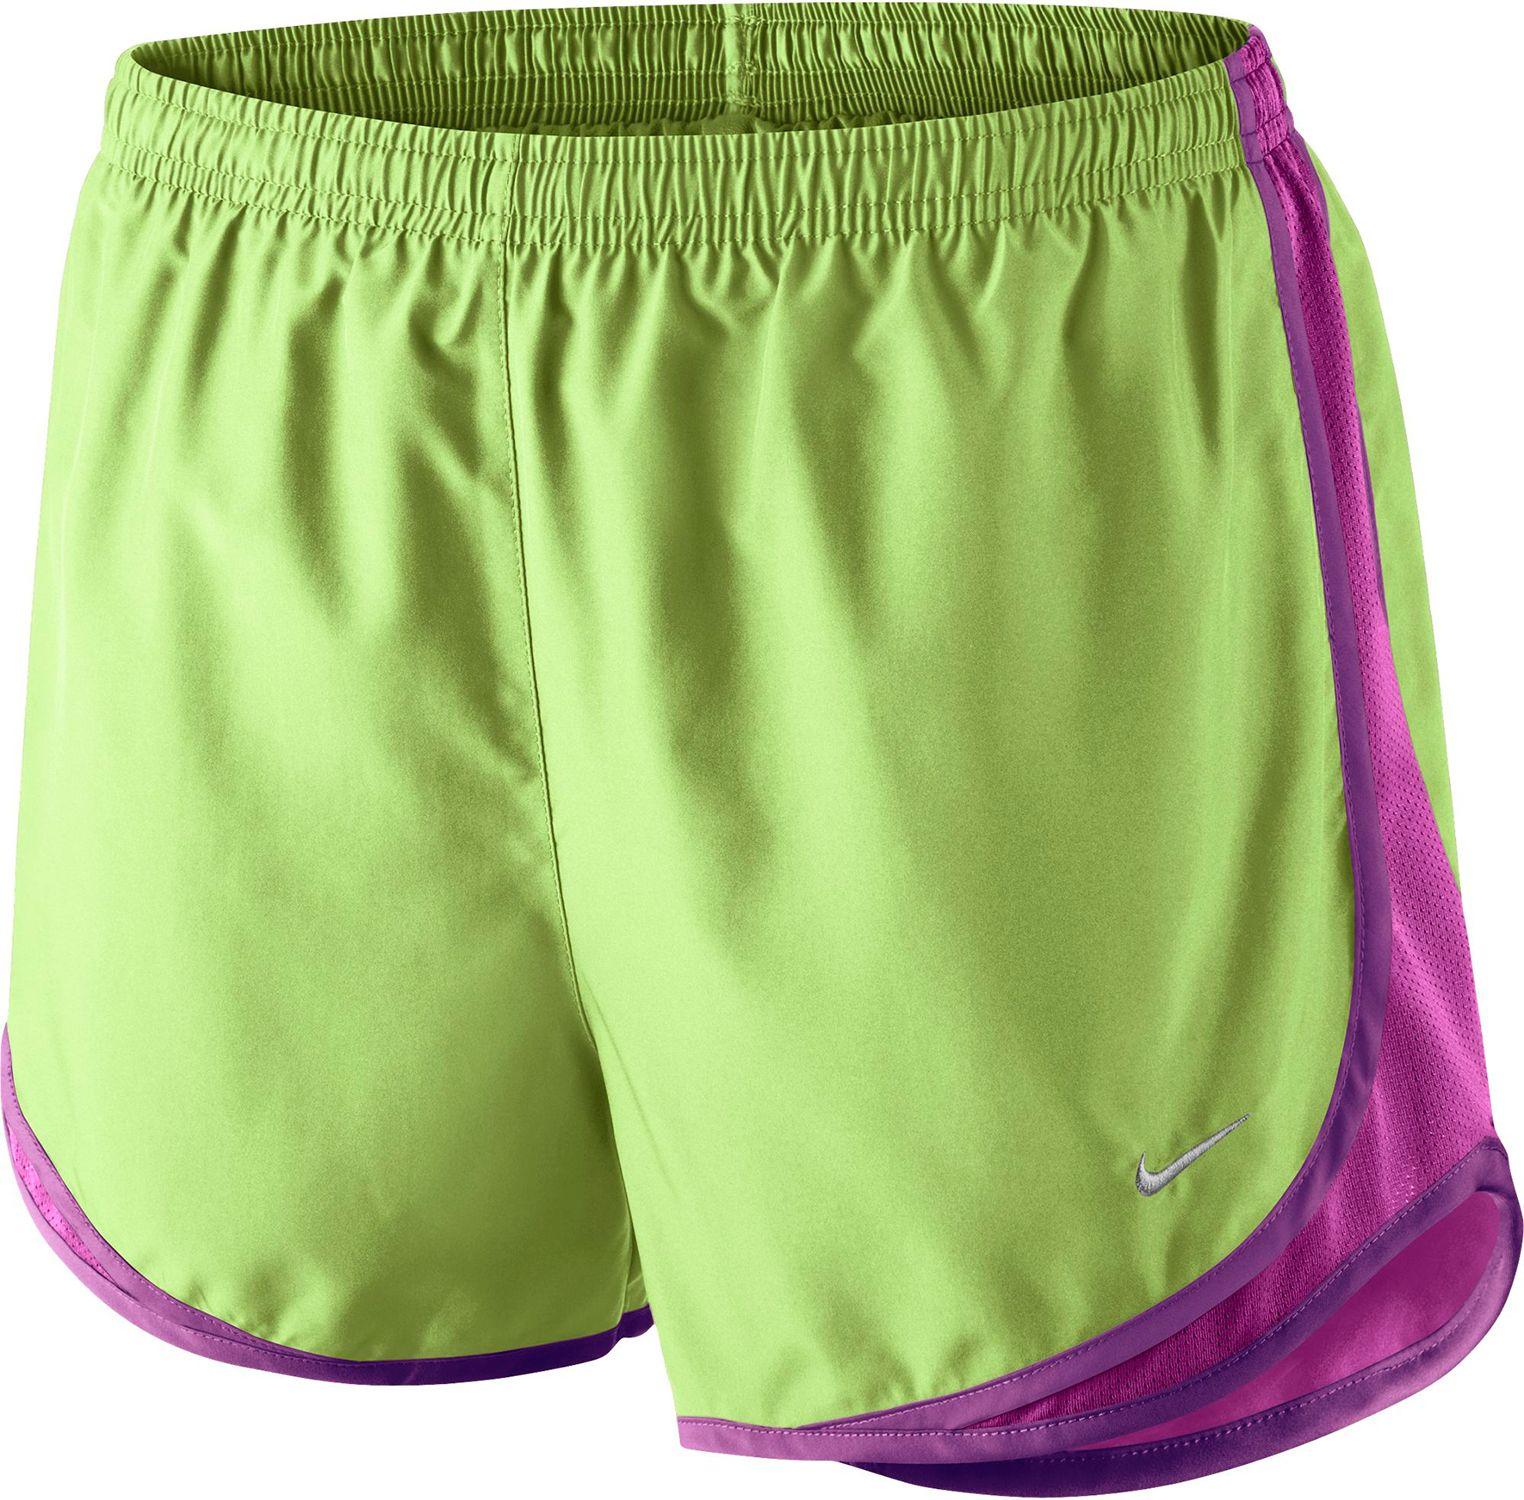 8c8c3259c delicate Nike Womens Tempo Running Shorts DICKS Sporting Goods ...